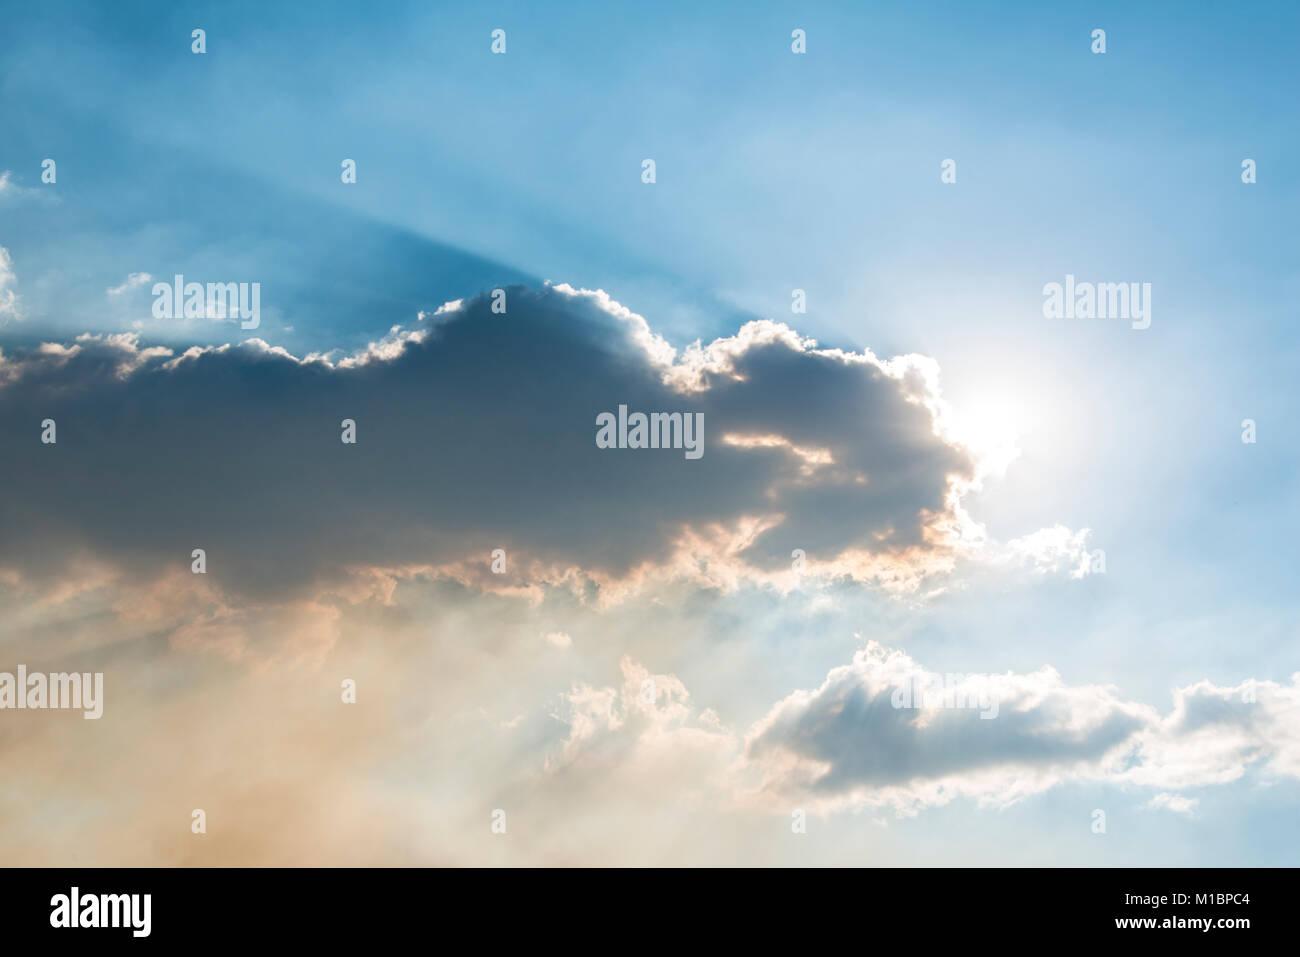 Sun shines behind dark cloud, California, USA - Stock Image